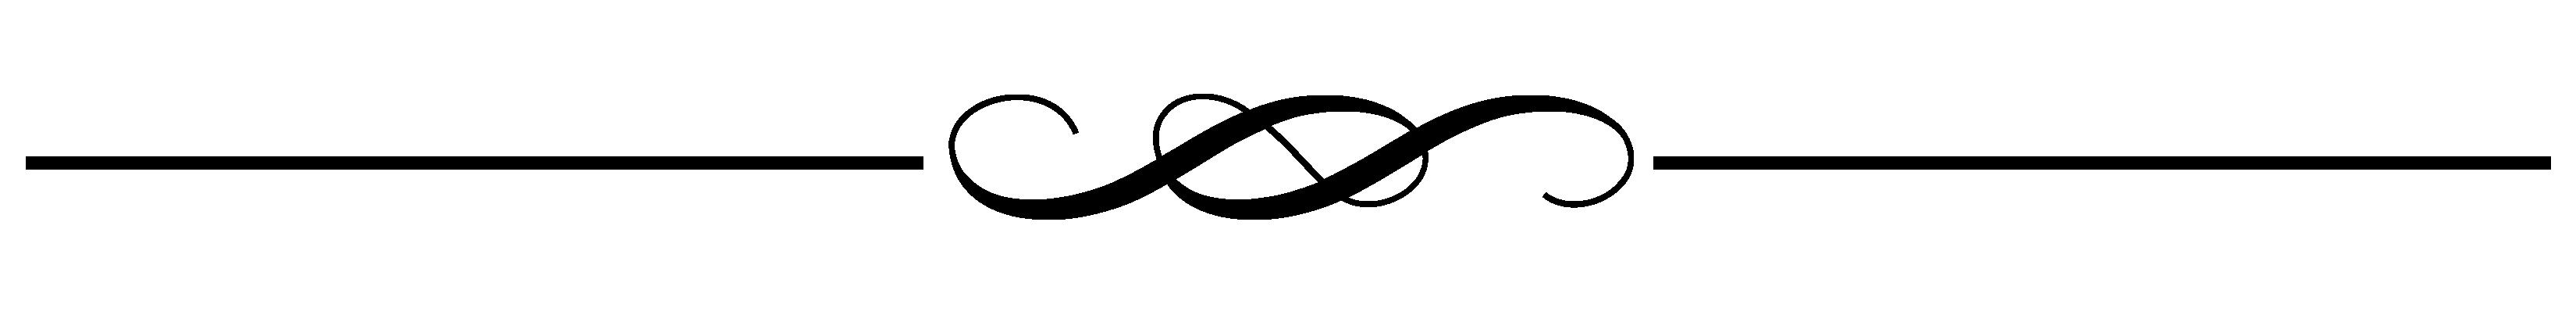 Line Separator Clipart.